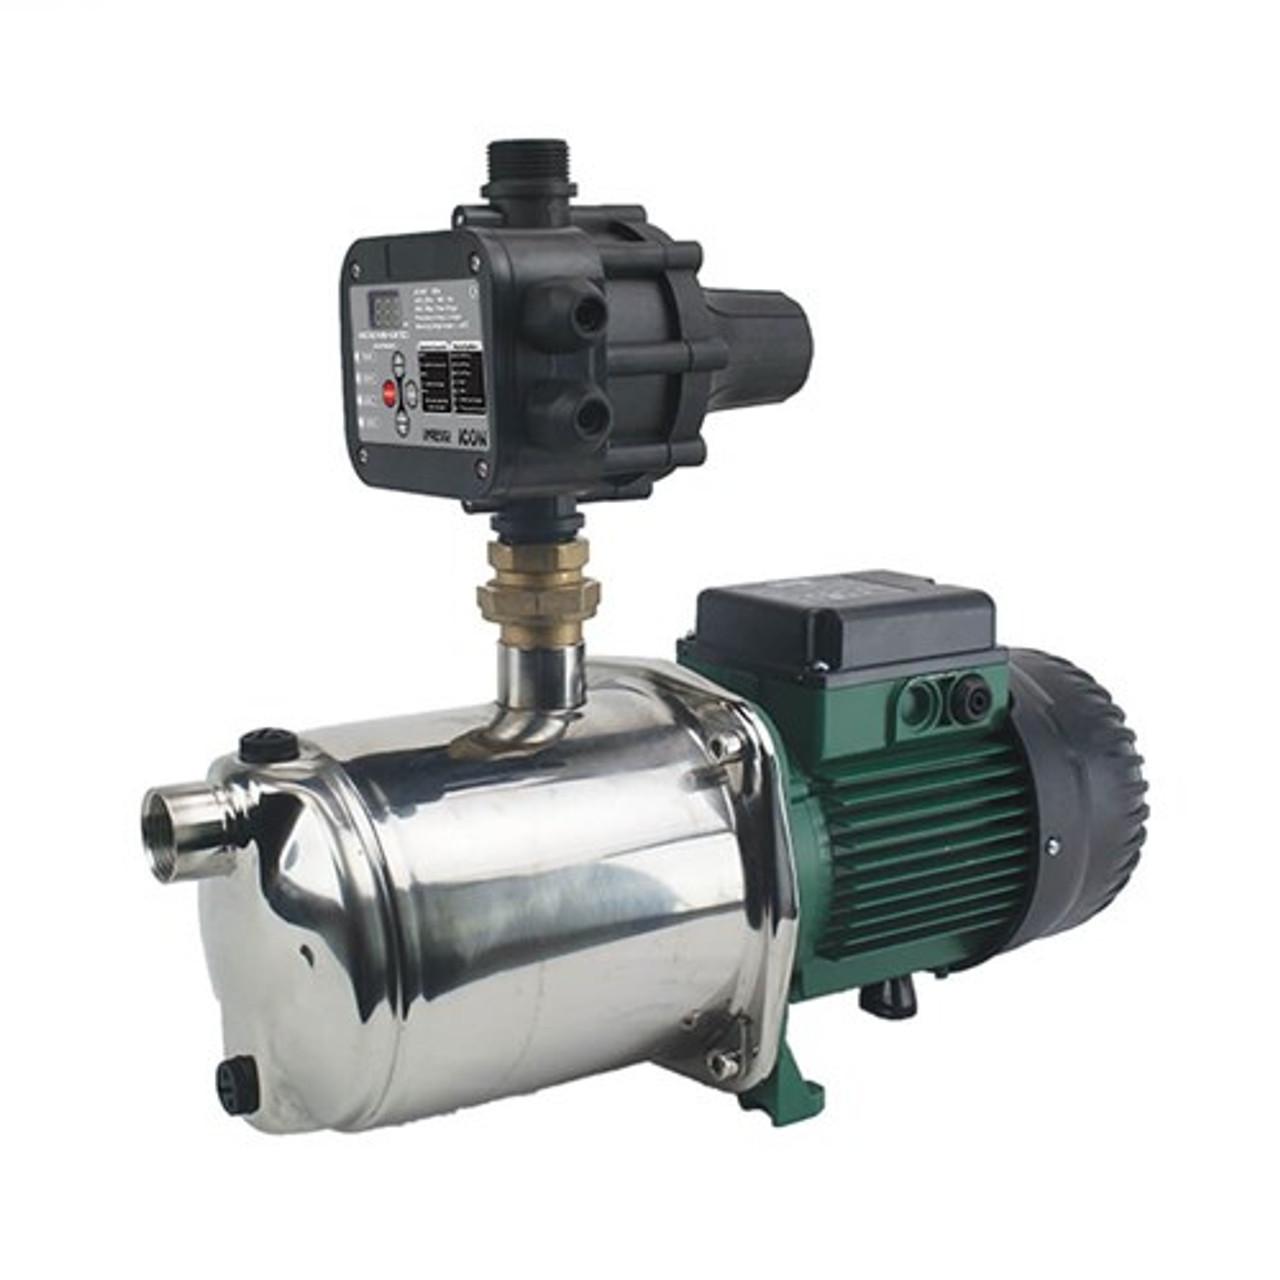 Dab Euroinox 40/50 Automatic Pressure Pump with s/steel pump and suction lift to 5m deep.   40 L/min @ 450 kPa to 60 L/min @ 350 kPa.